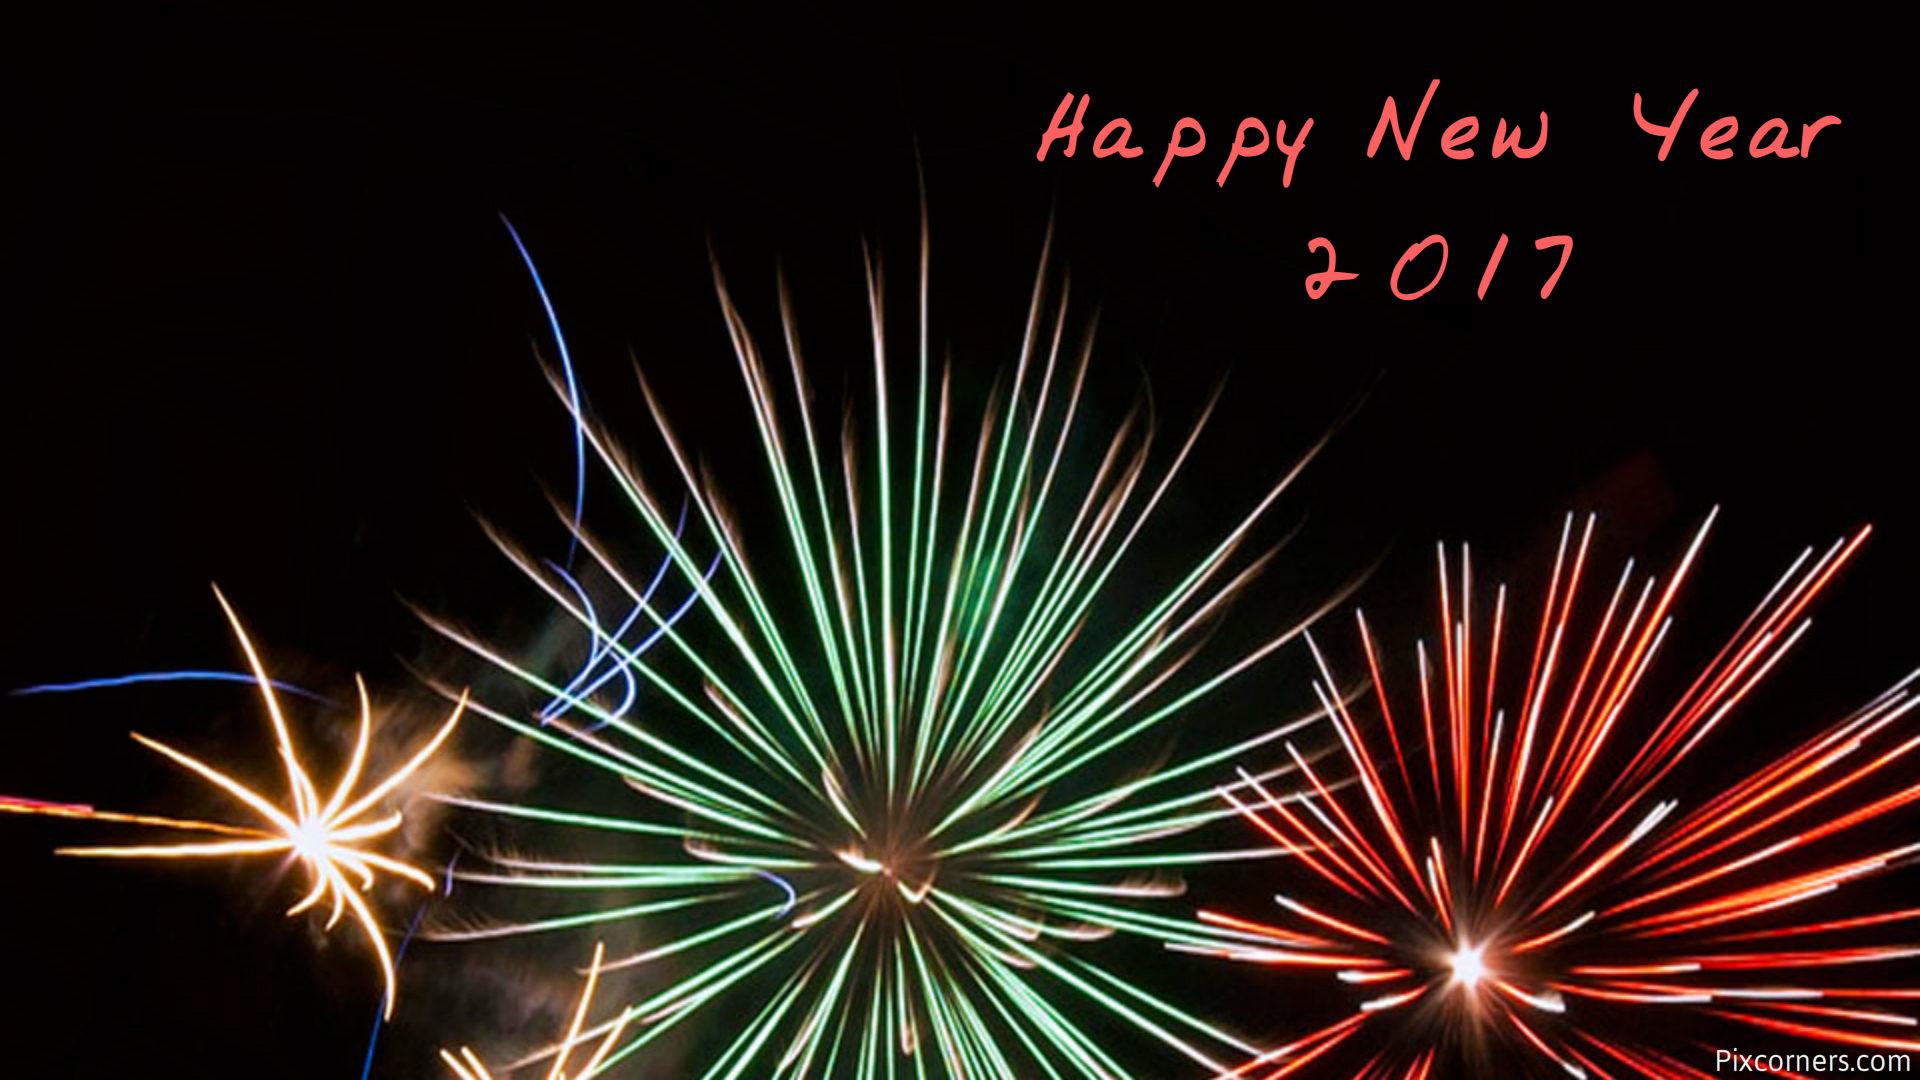 Happy New Year 2017 Wallpaper HD Fireworks